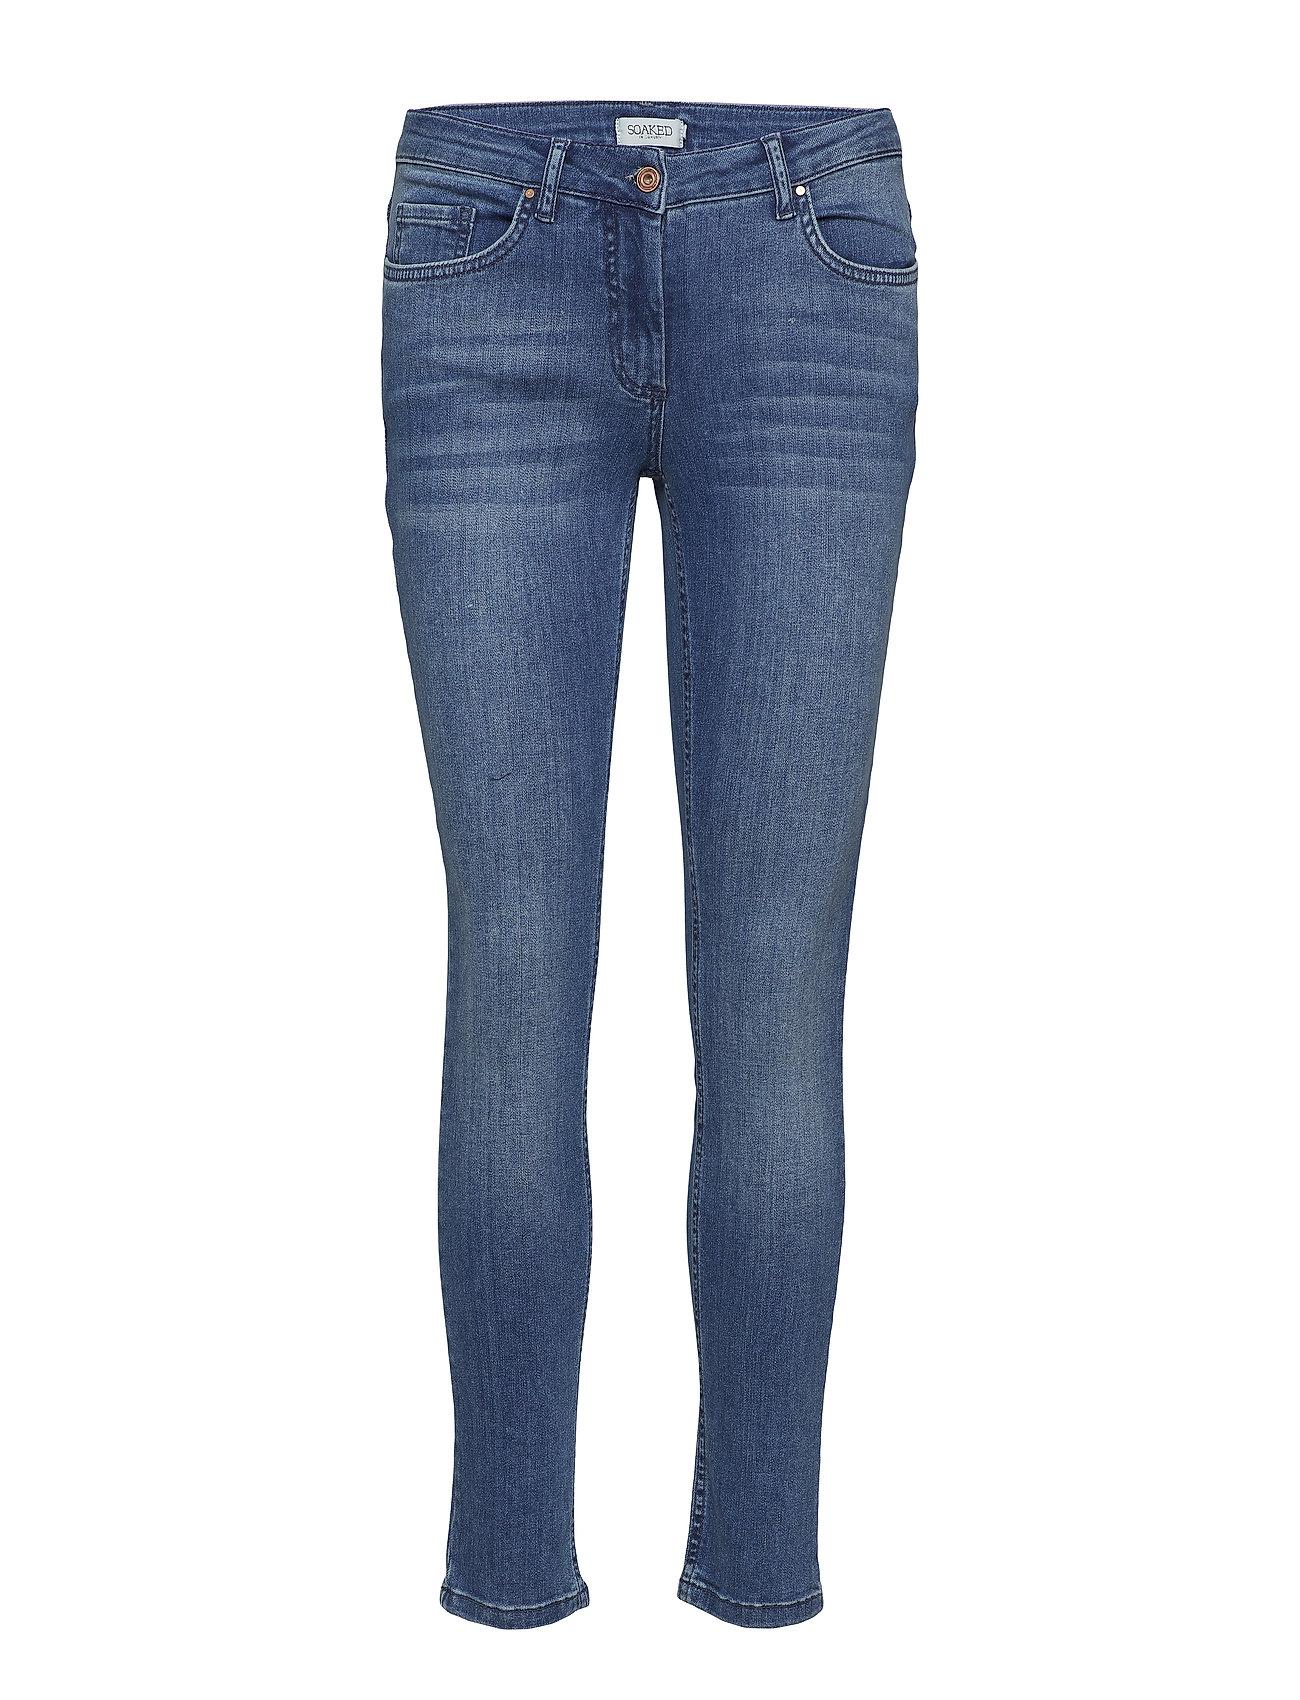 Soaked in Luxury Callas Jeans - MEDIUM BLUE DENIM